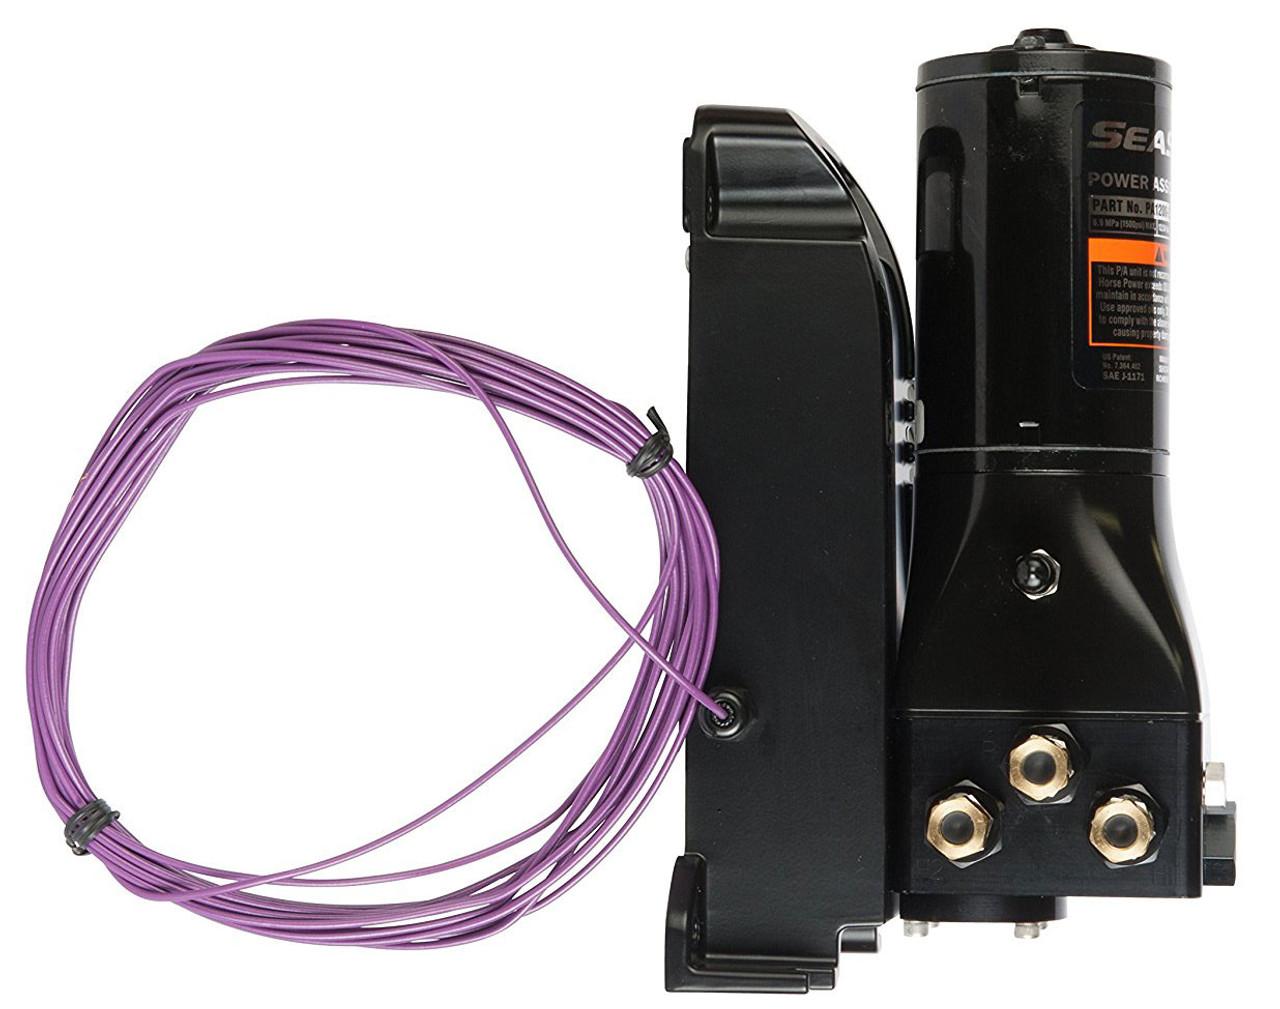 Seastar Pa1225 2 Power Assist Unit Marine Steering For Atlas Jack Plate Wiring Harness Hydraulic 12v 24v 25ft